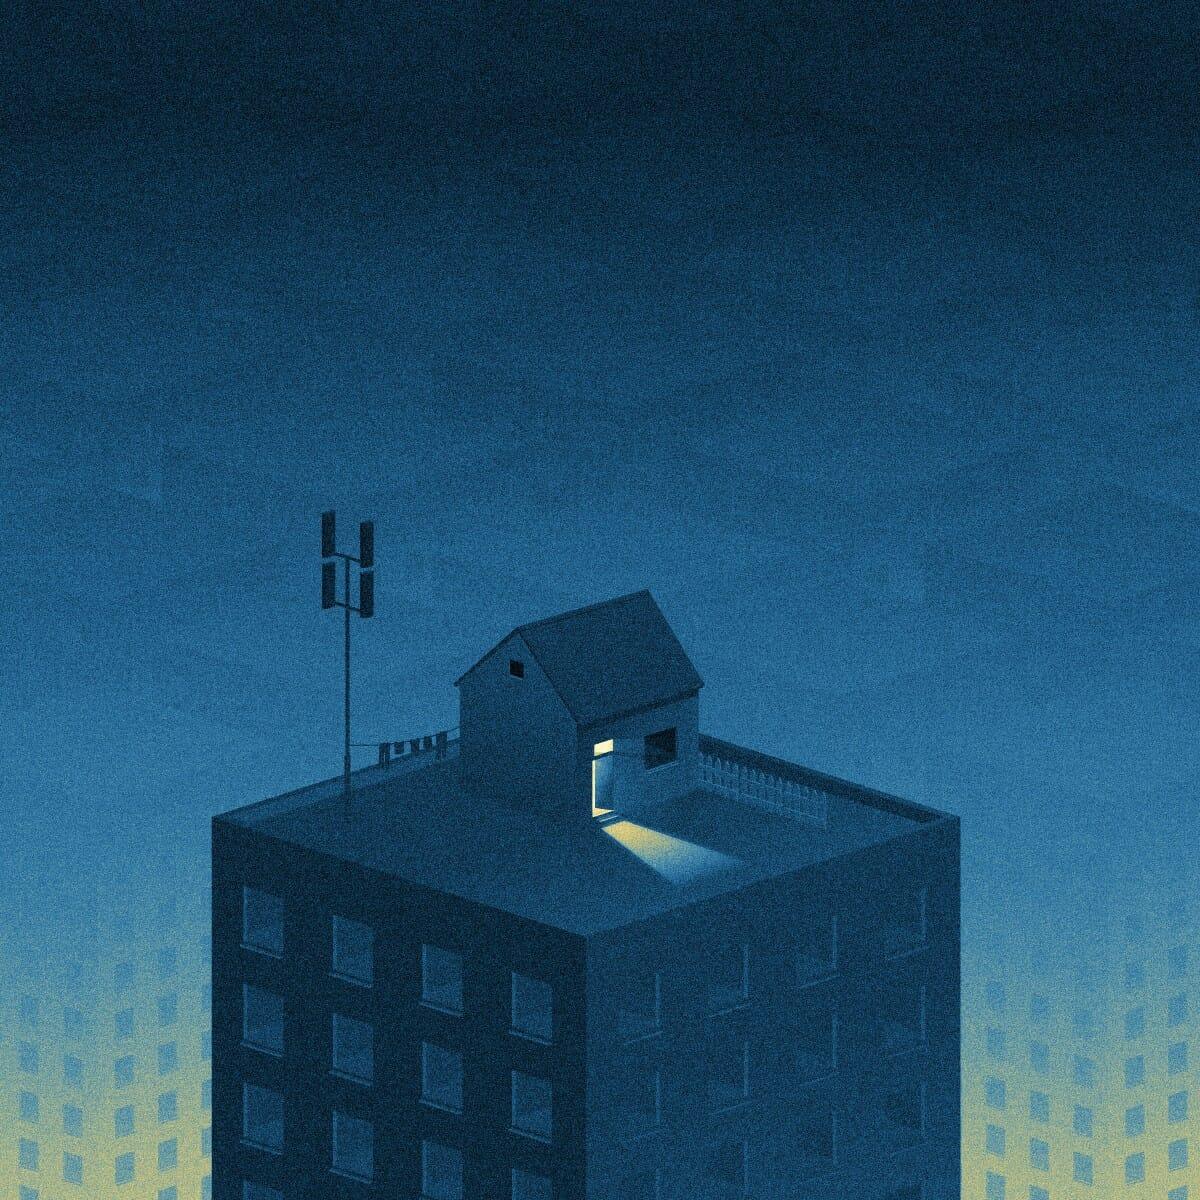 Big City Lights : Série d'illustrations signée Ivo van de Grift 1